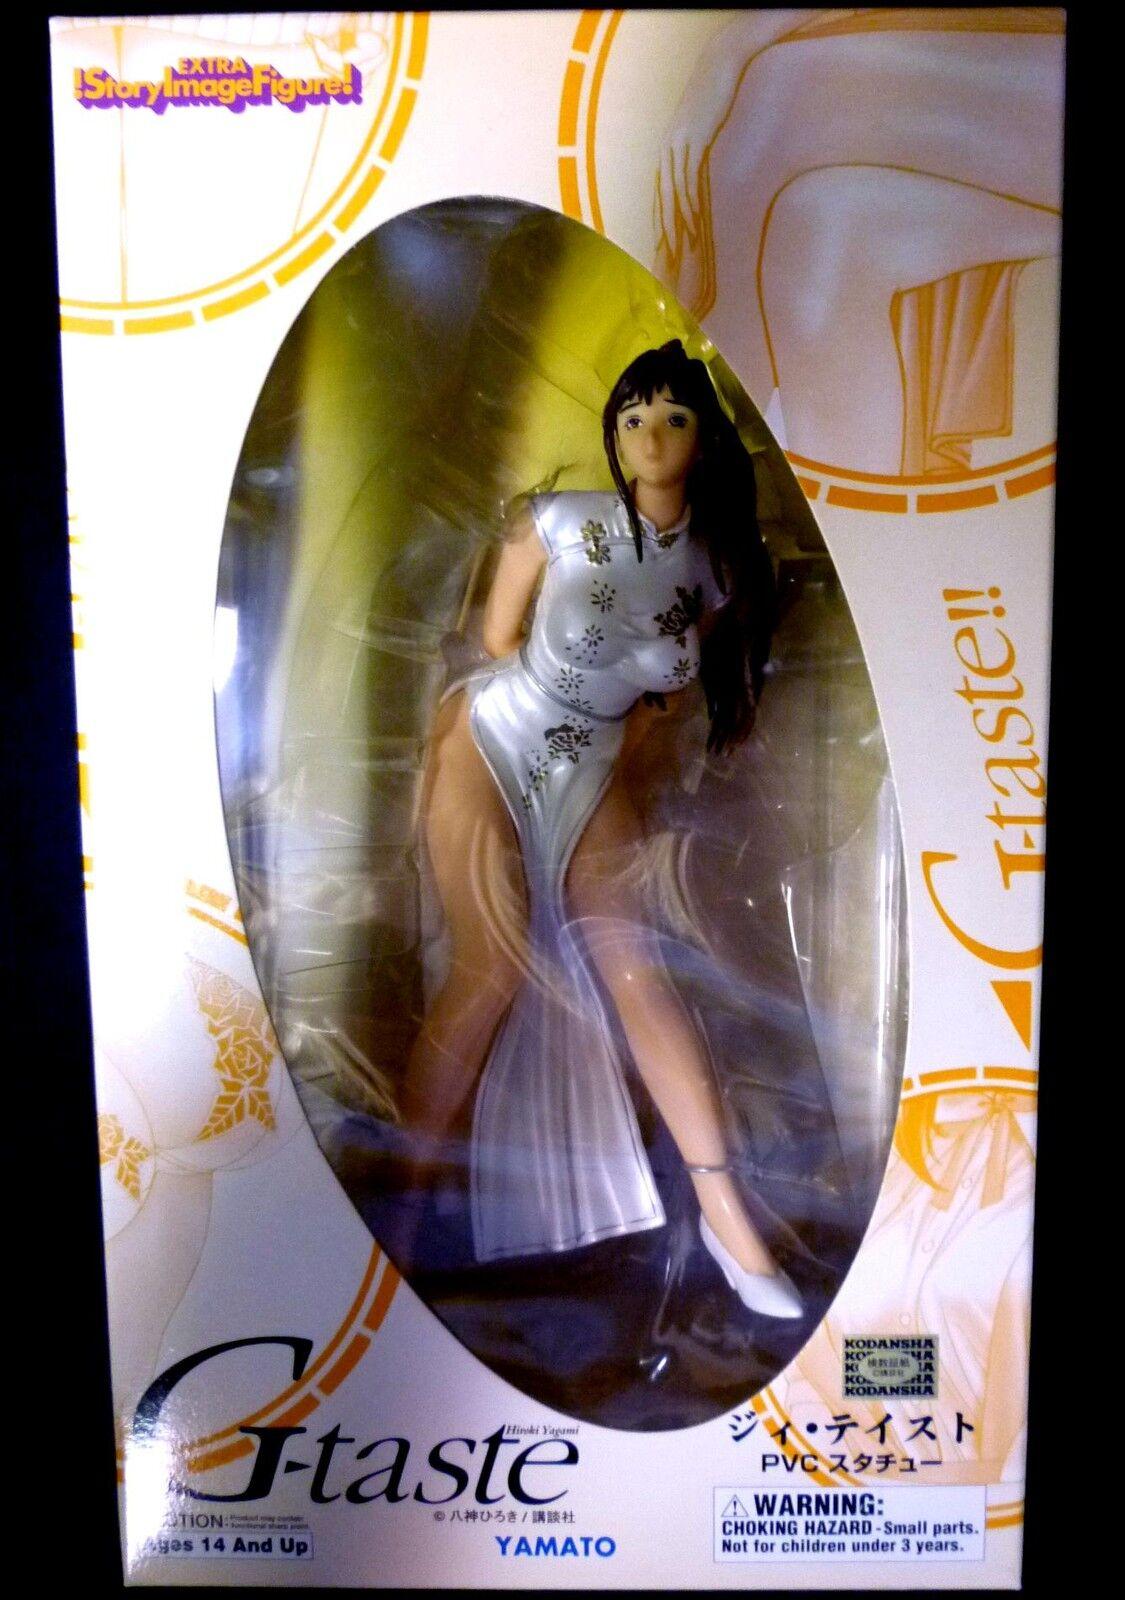 It's a G-Taste Yamato Yuki Shihoudou PVC Statue Hiroki Yagami  Anime New .